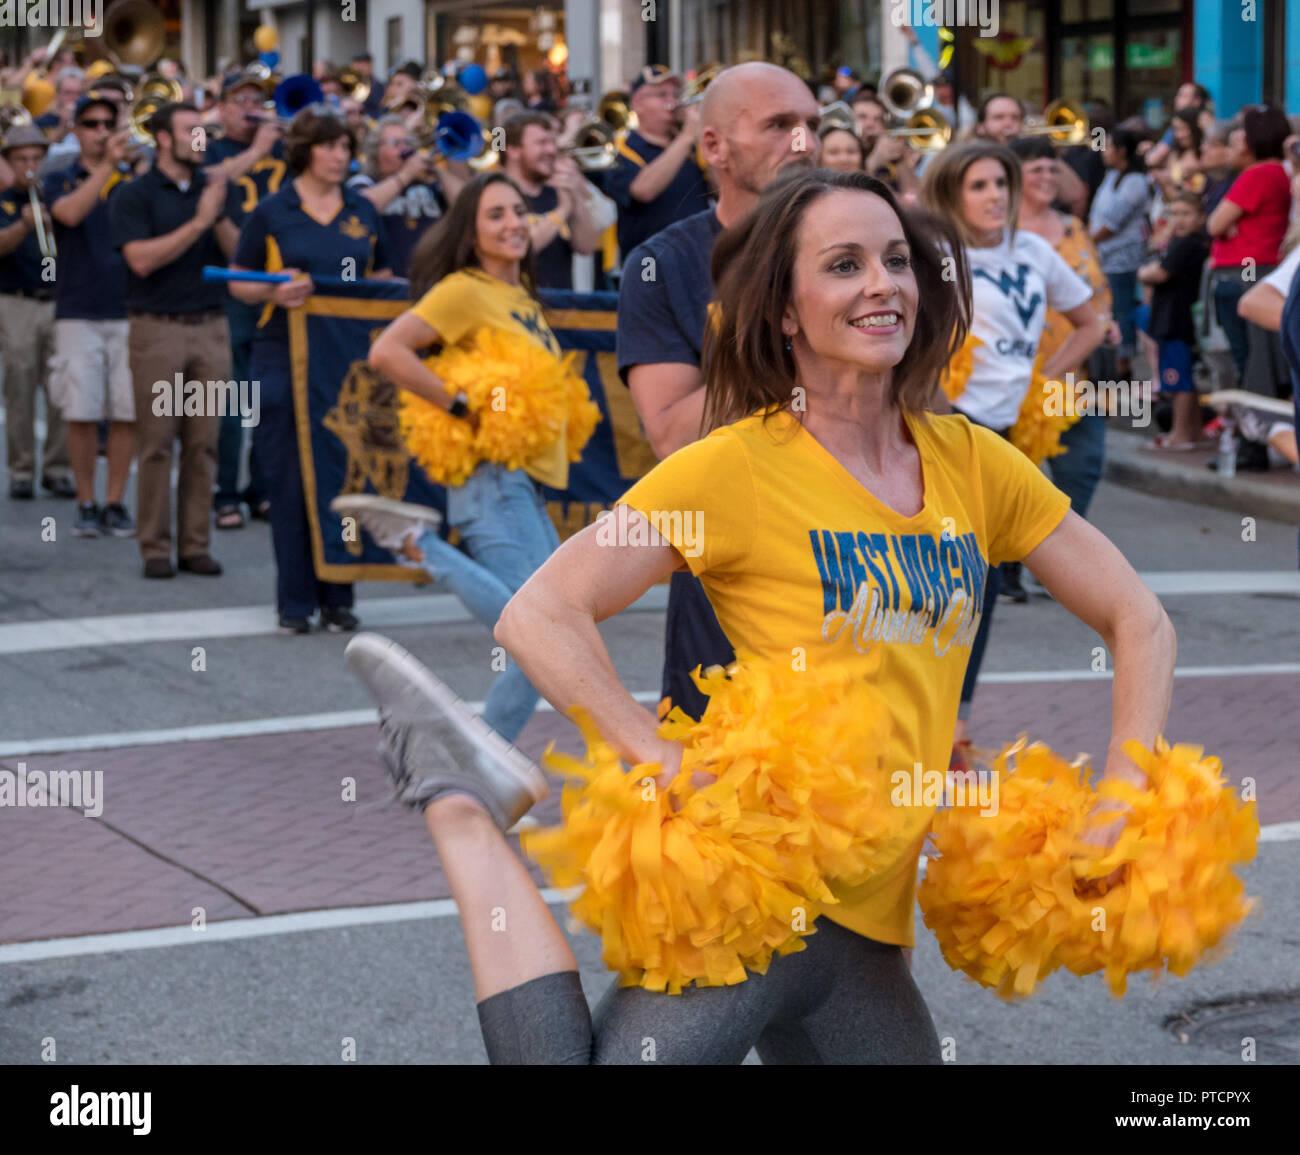 WVU Alumni cheer leading troupe in Morgantown WV - Stock Image